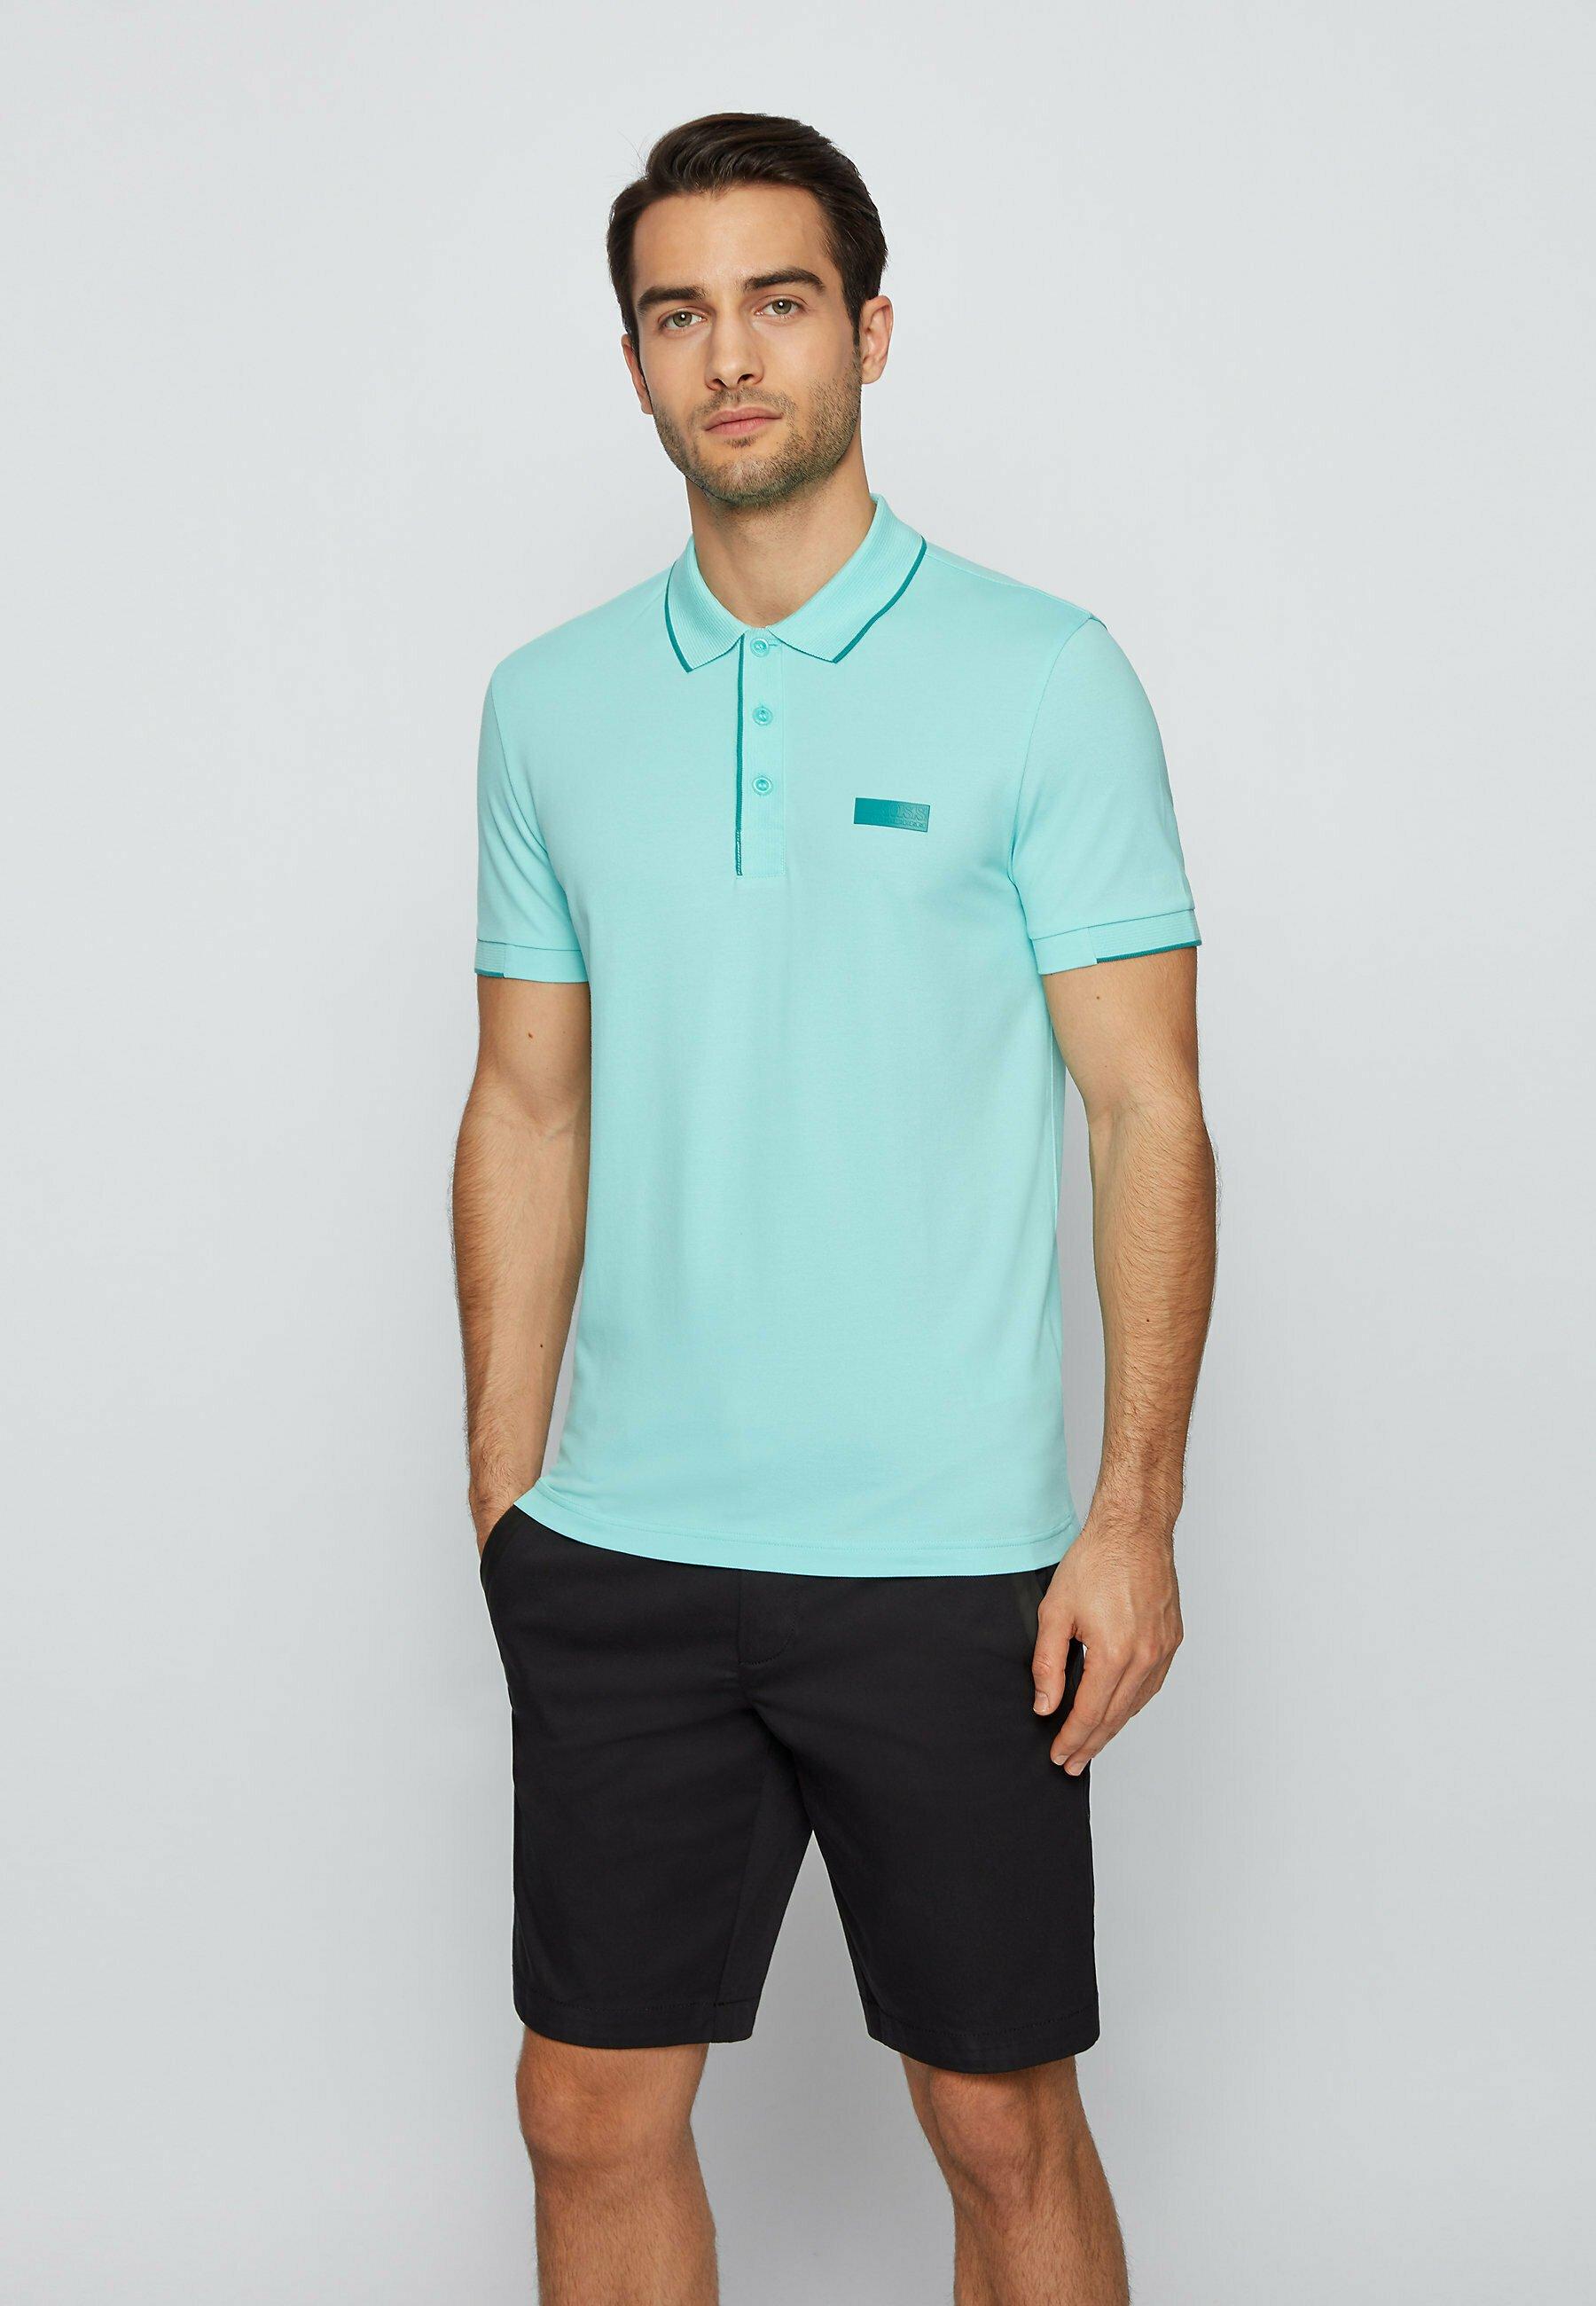 Herrer PAUL BATCH - Poloshirts